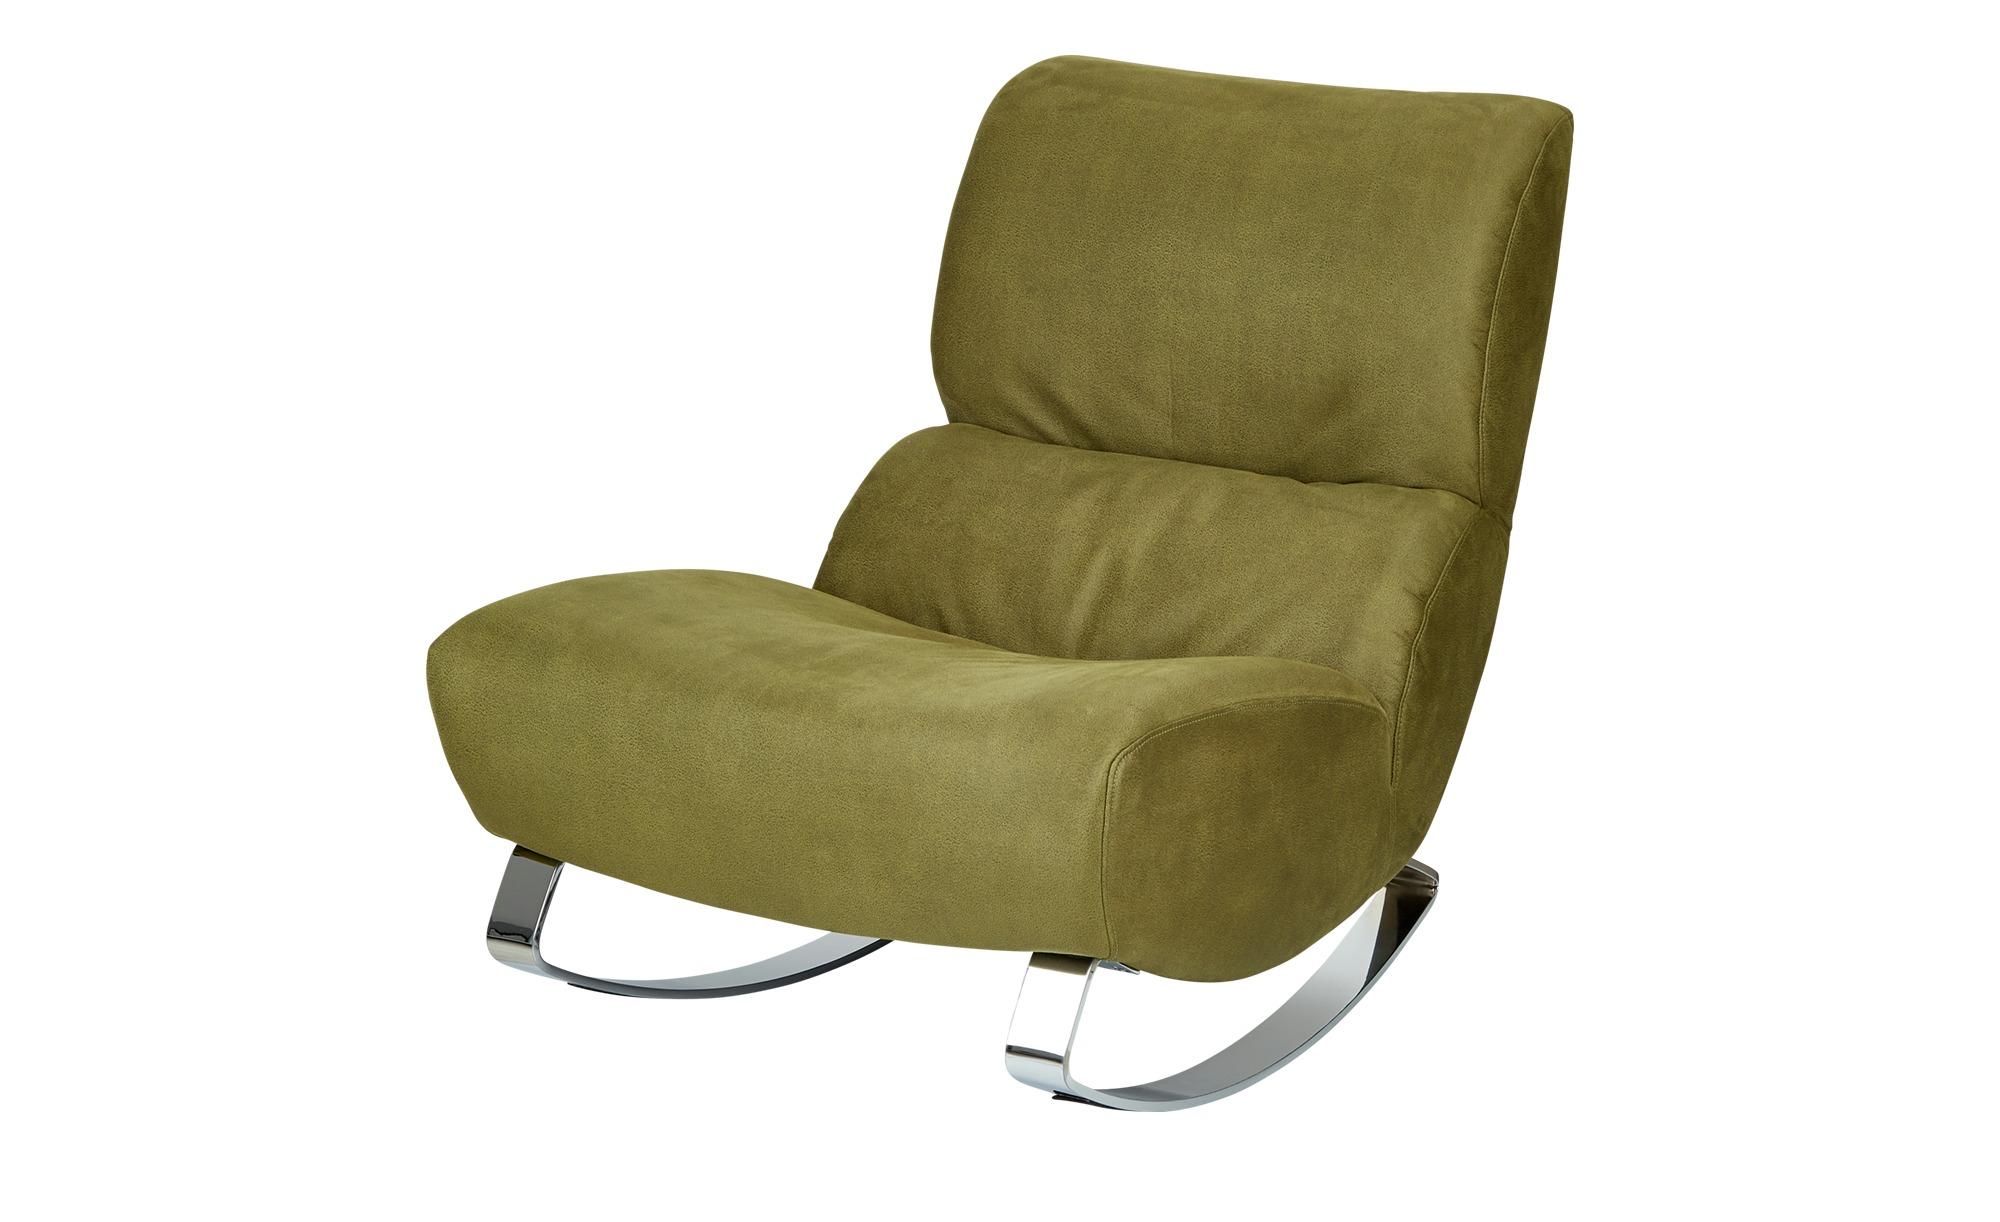 pop Design-Sessel grün - Stoff Citole ¦ grün ¦ Maße (cm): B: 76 H: 90 T: 103 Polstermöbel > Sessel > Polstersessel - Höffner